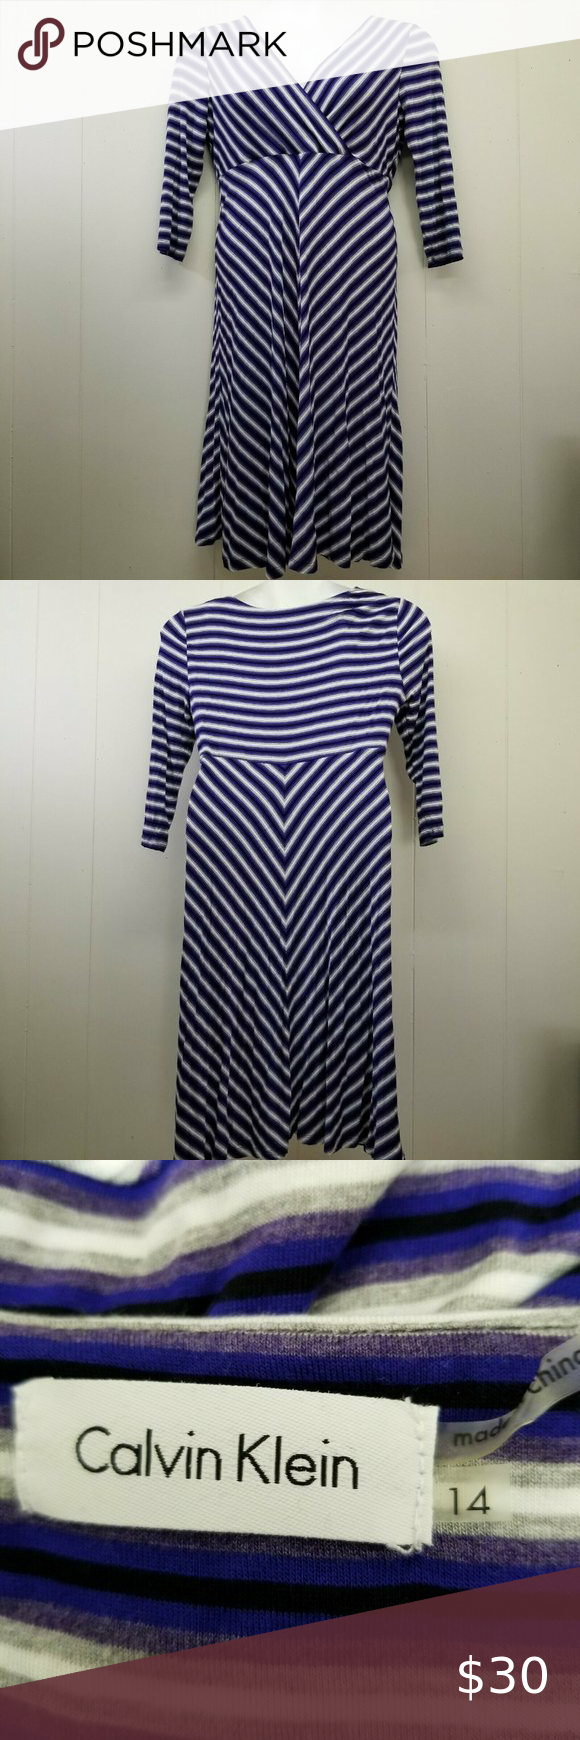 Calvin Klein 14 Dress Blue Striped Surplice Wrap